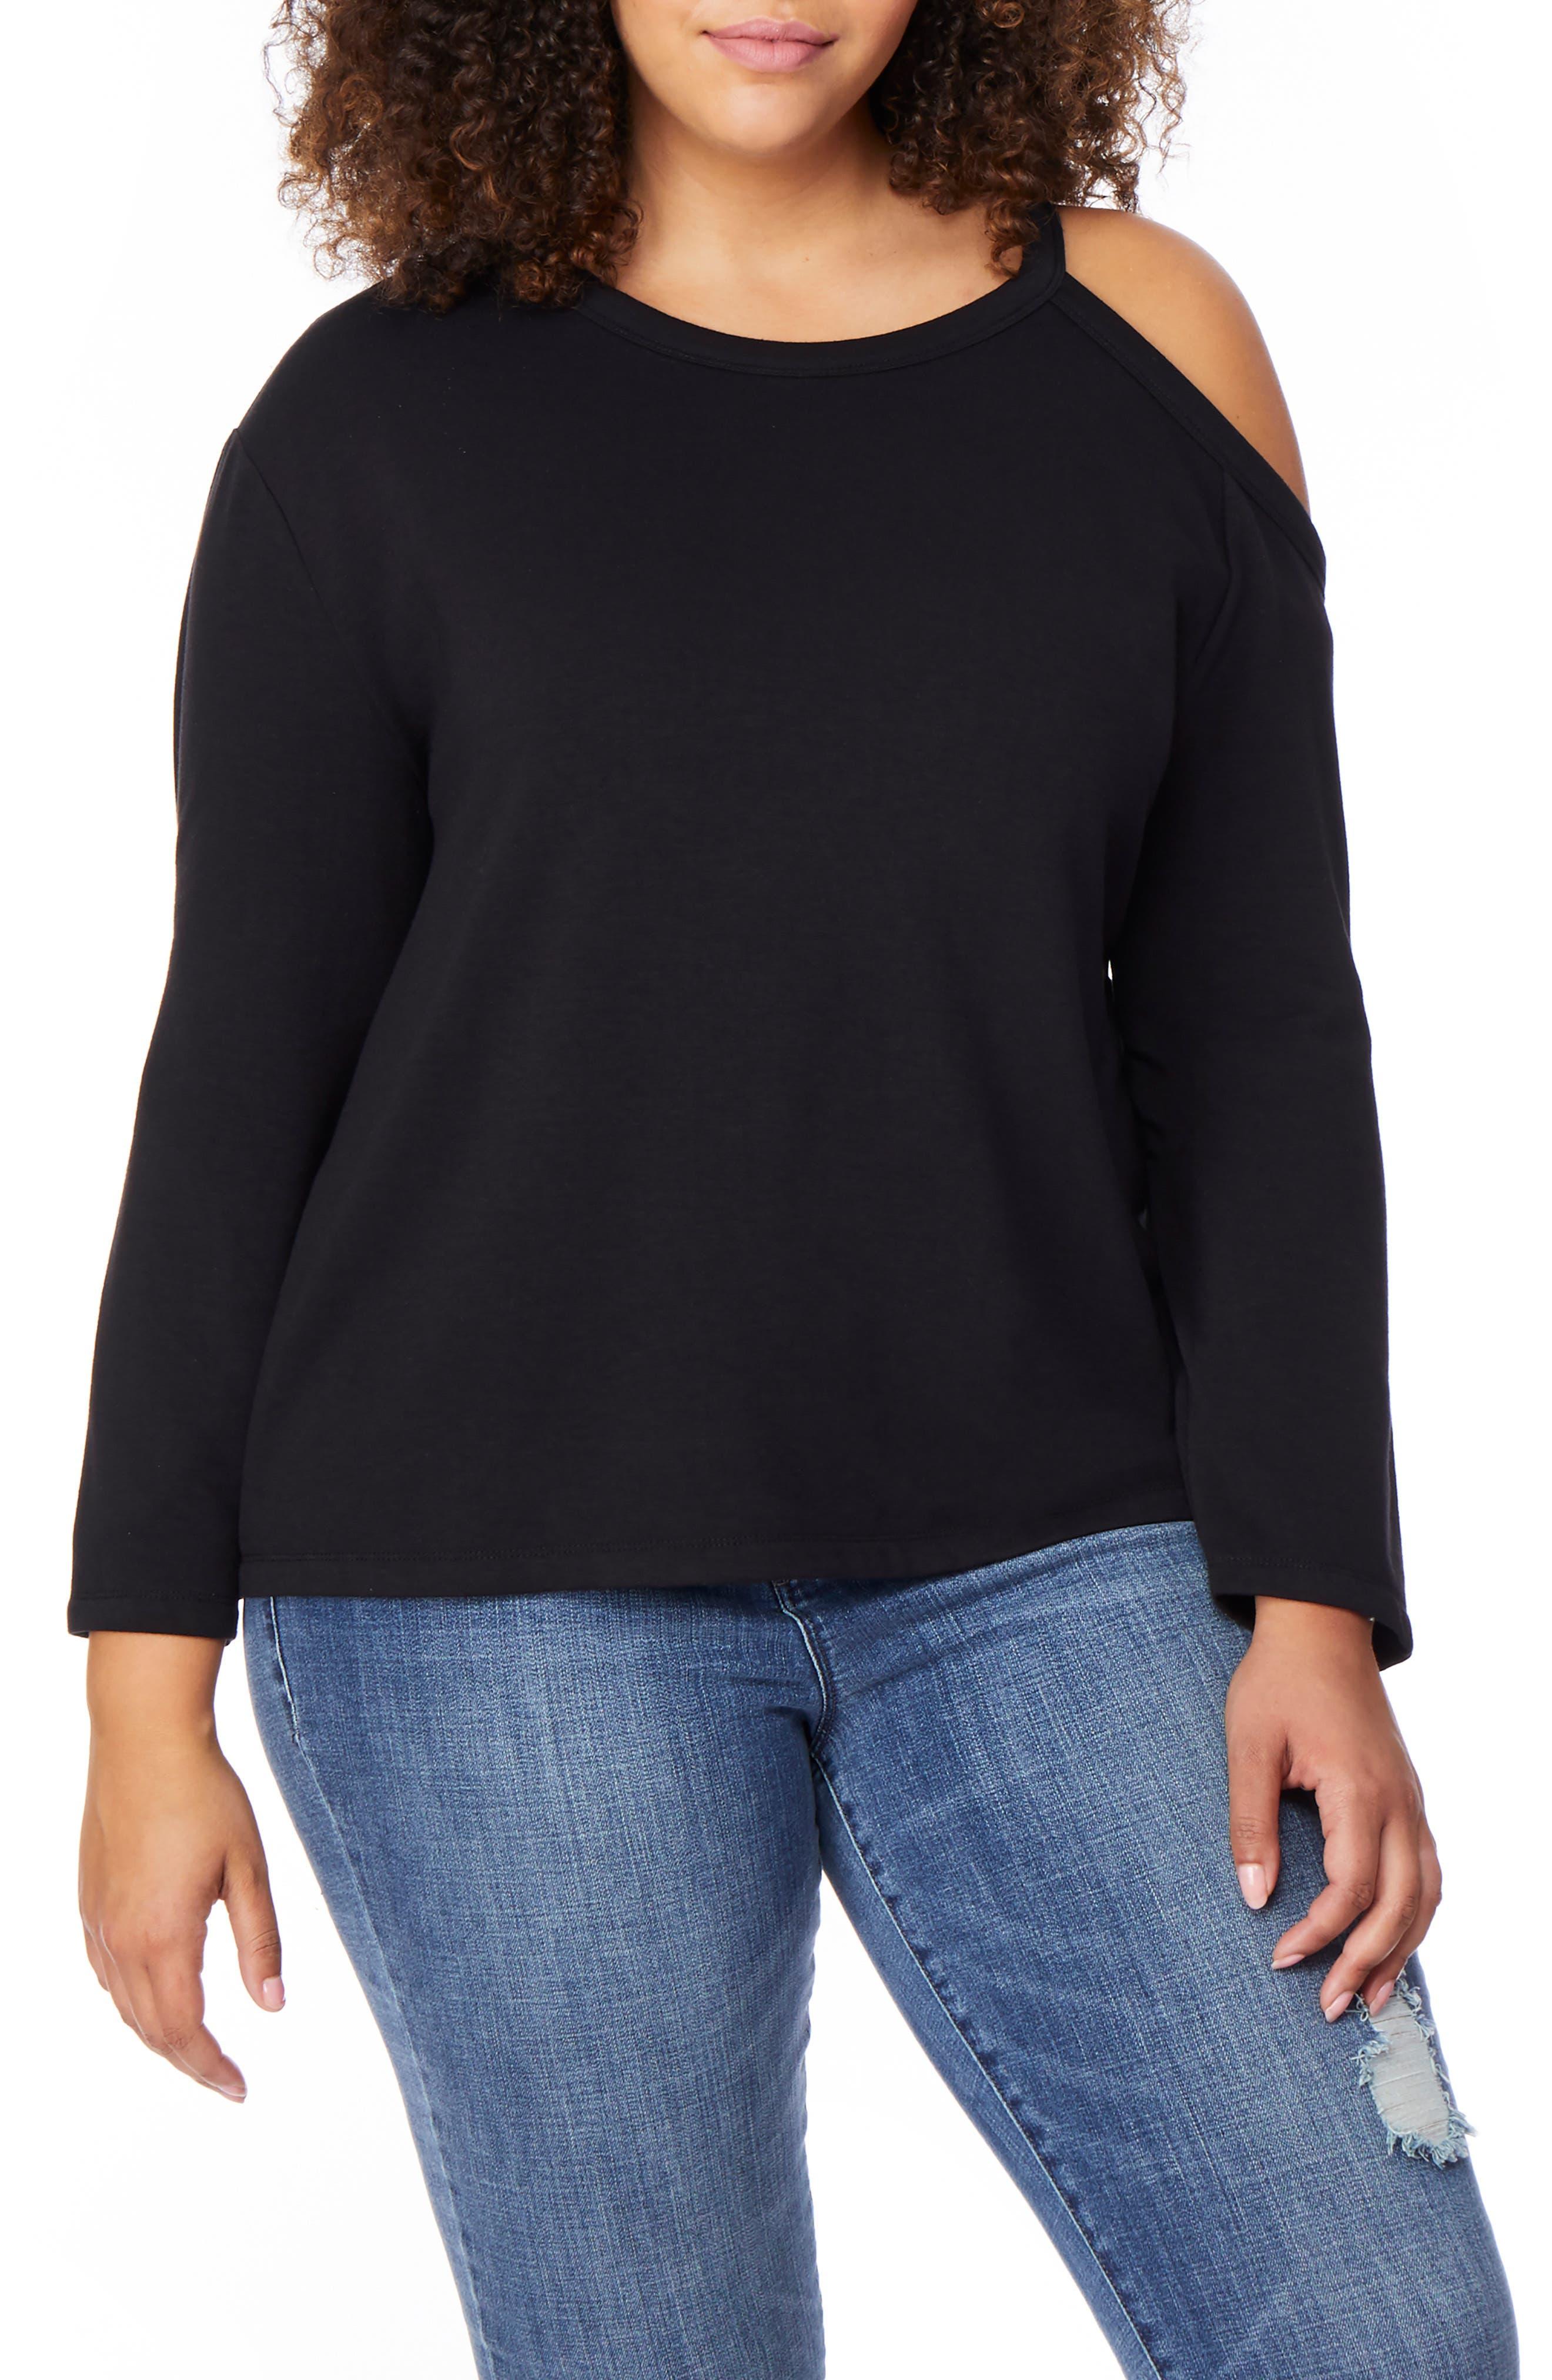 REBEL WILSON X ANGELS Cold Shoulder Sweatshirt, Main, color, BLACK